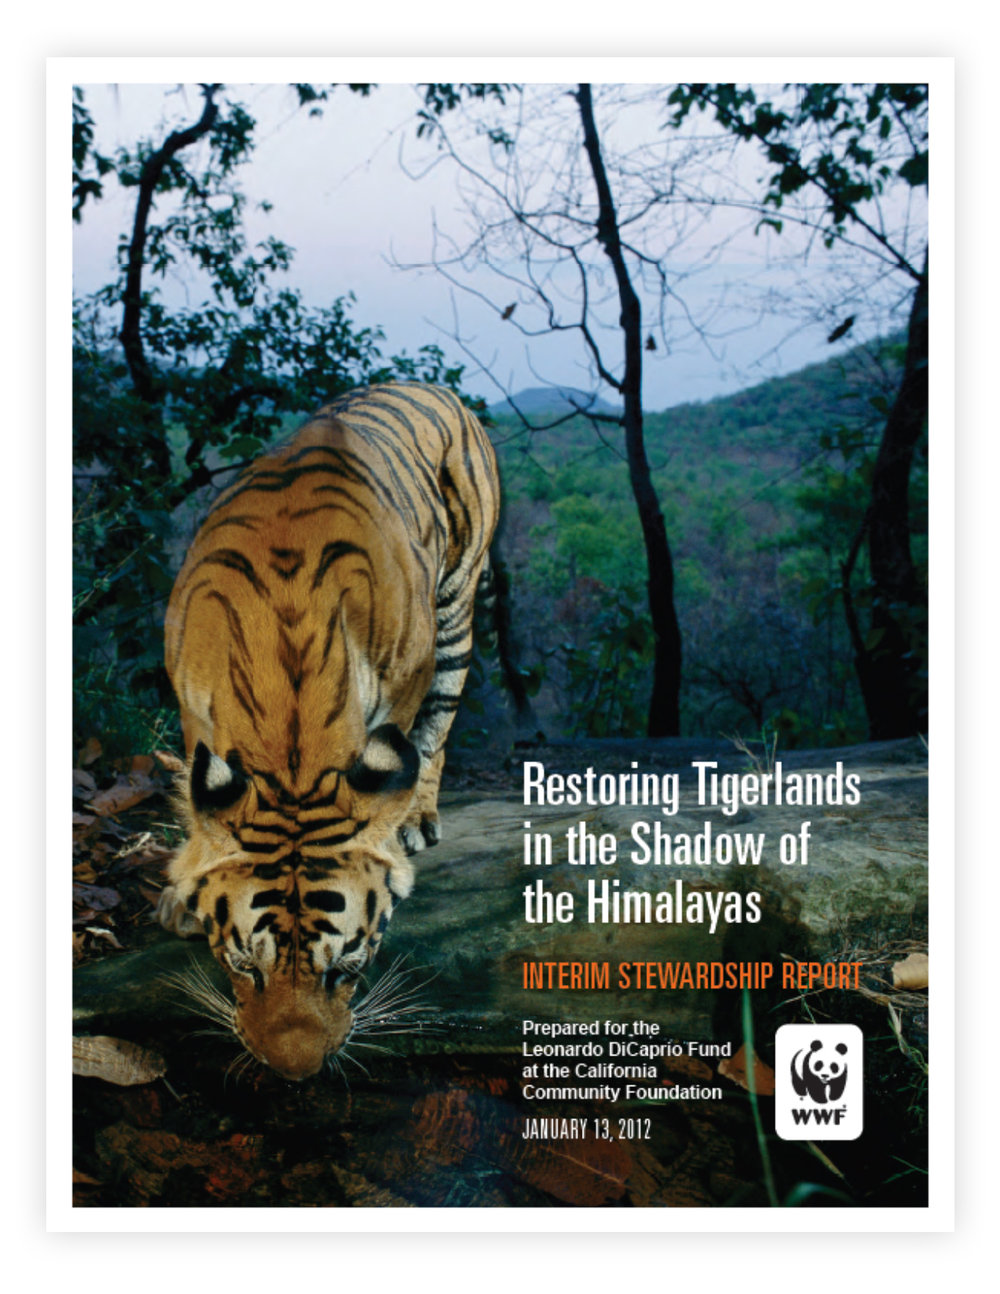 WWF_Stewardship_1.jpg